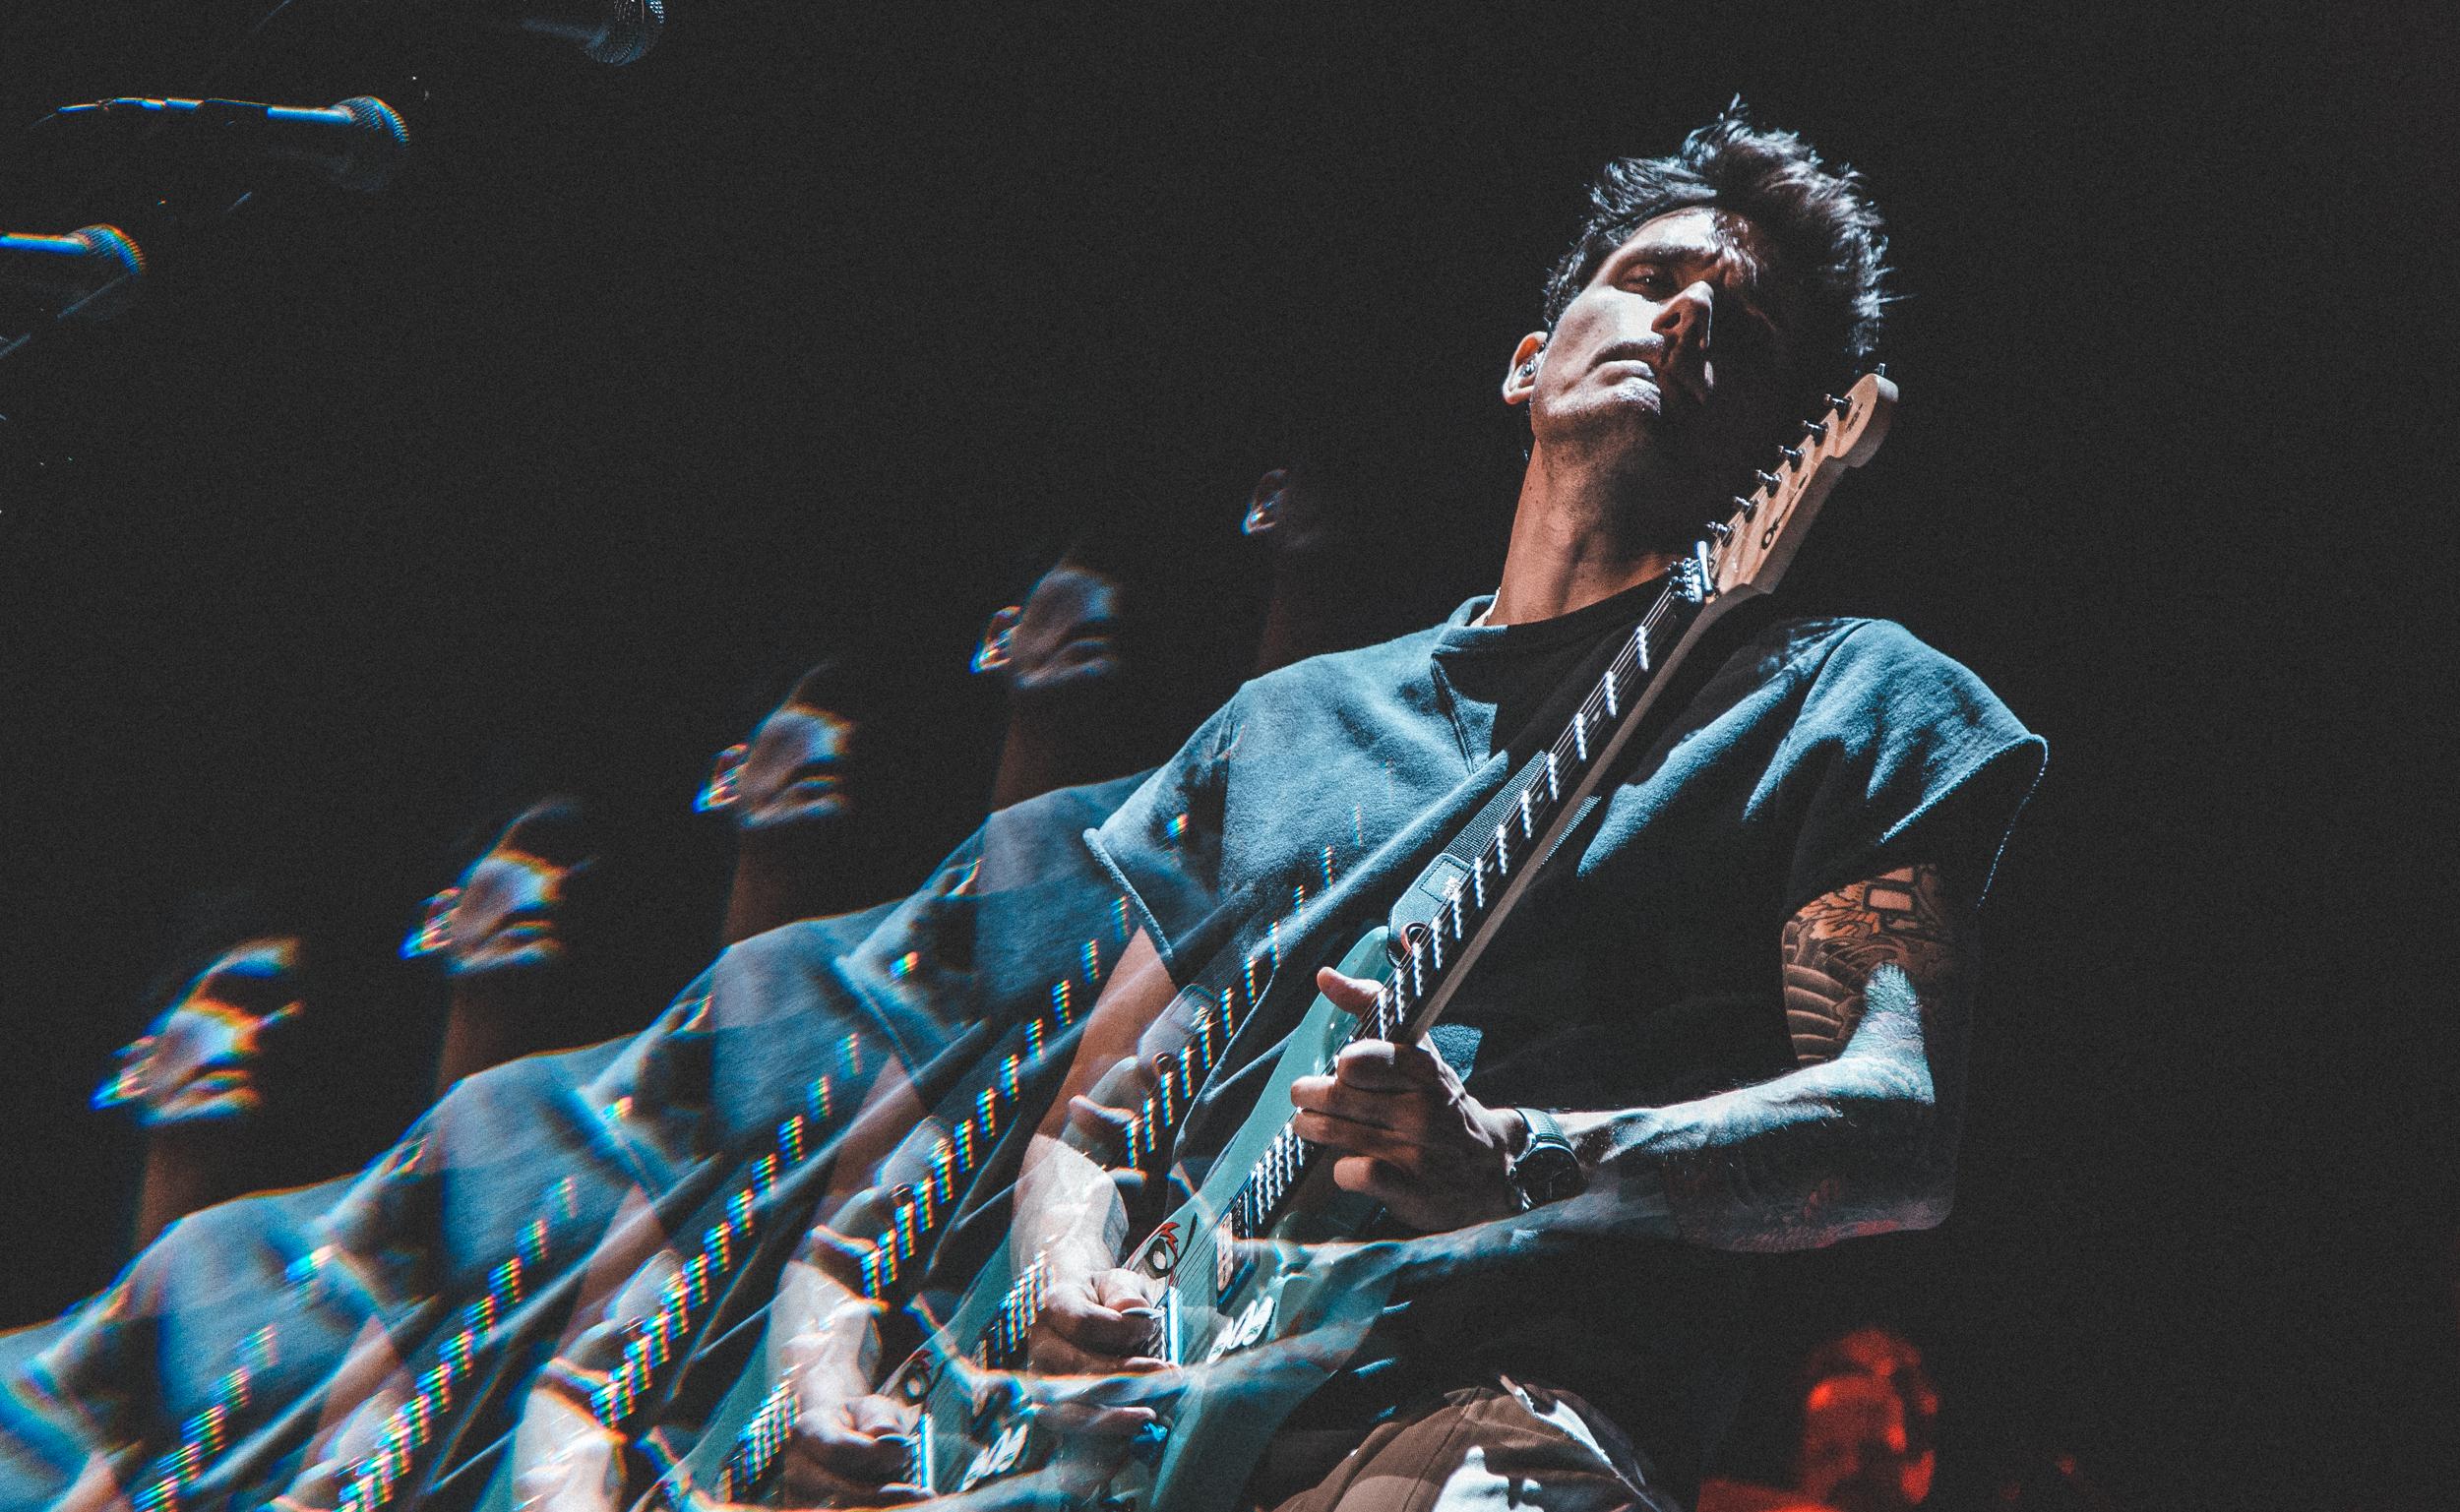 John Mayer-Rod_Laver-1283.jpg